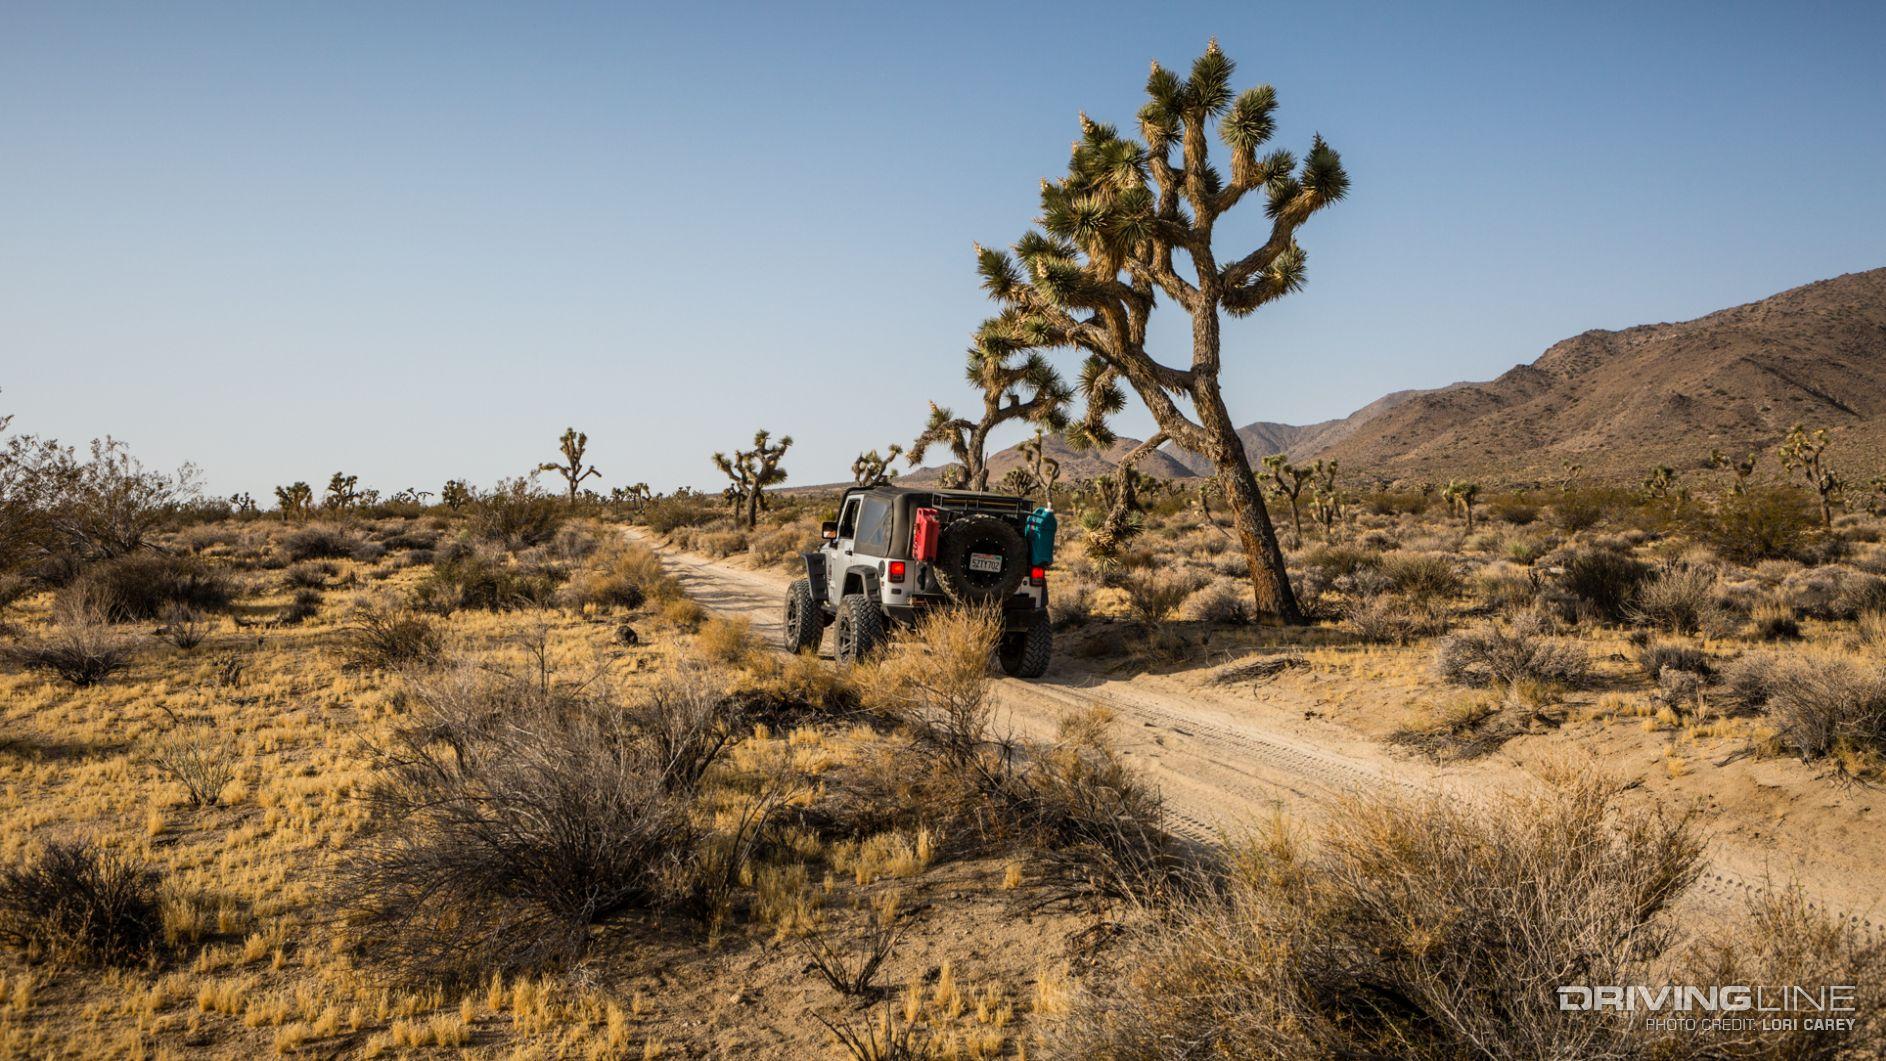 Berdoo Canyon Trail Review | DrivingLine